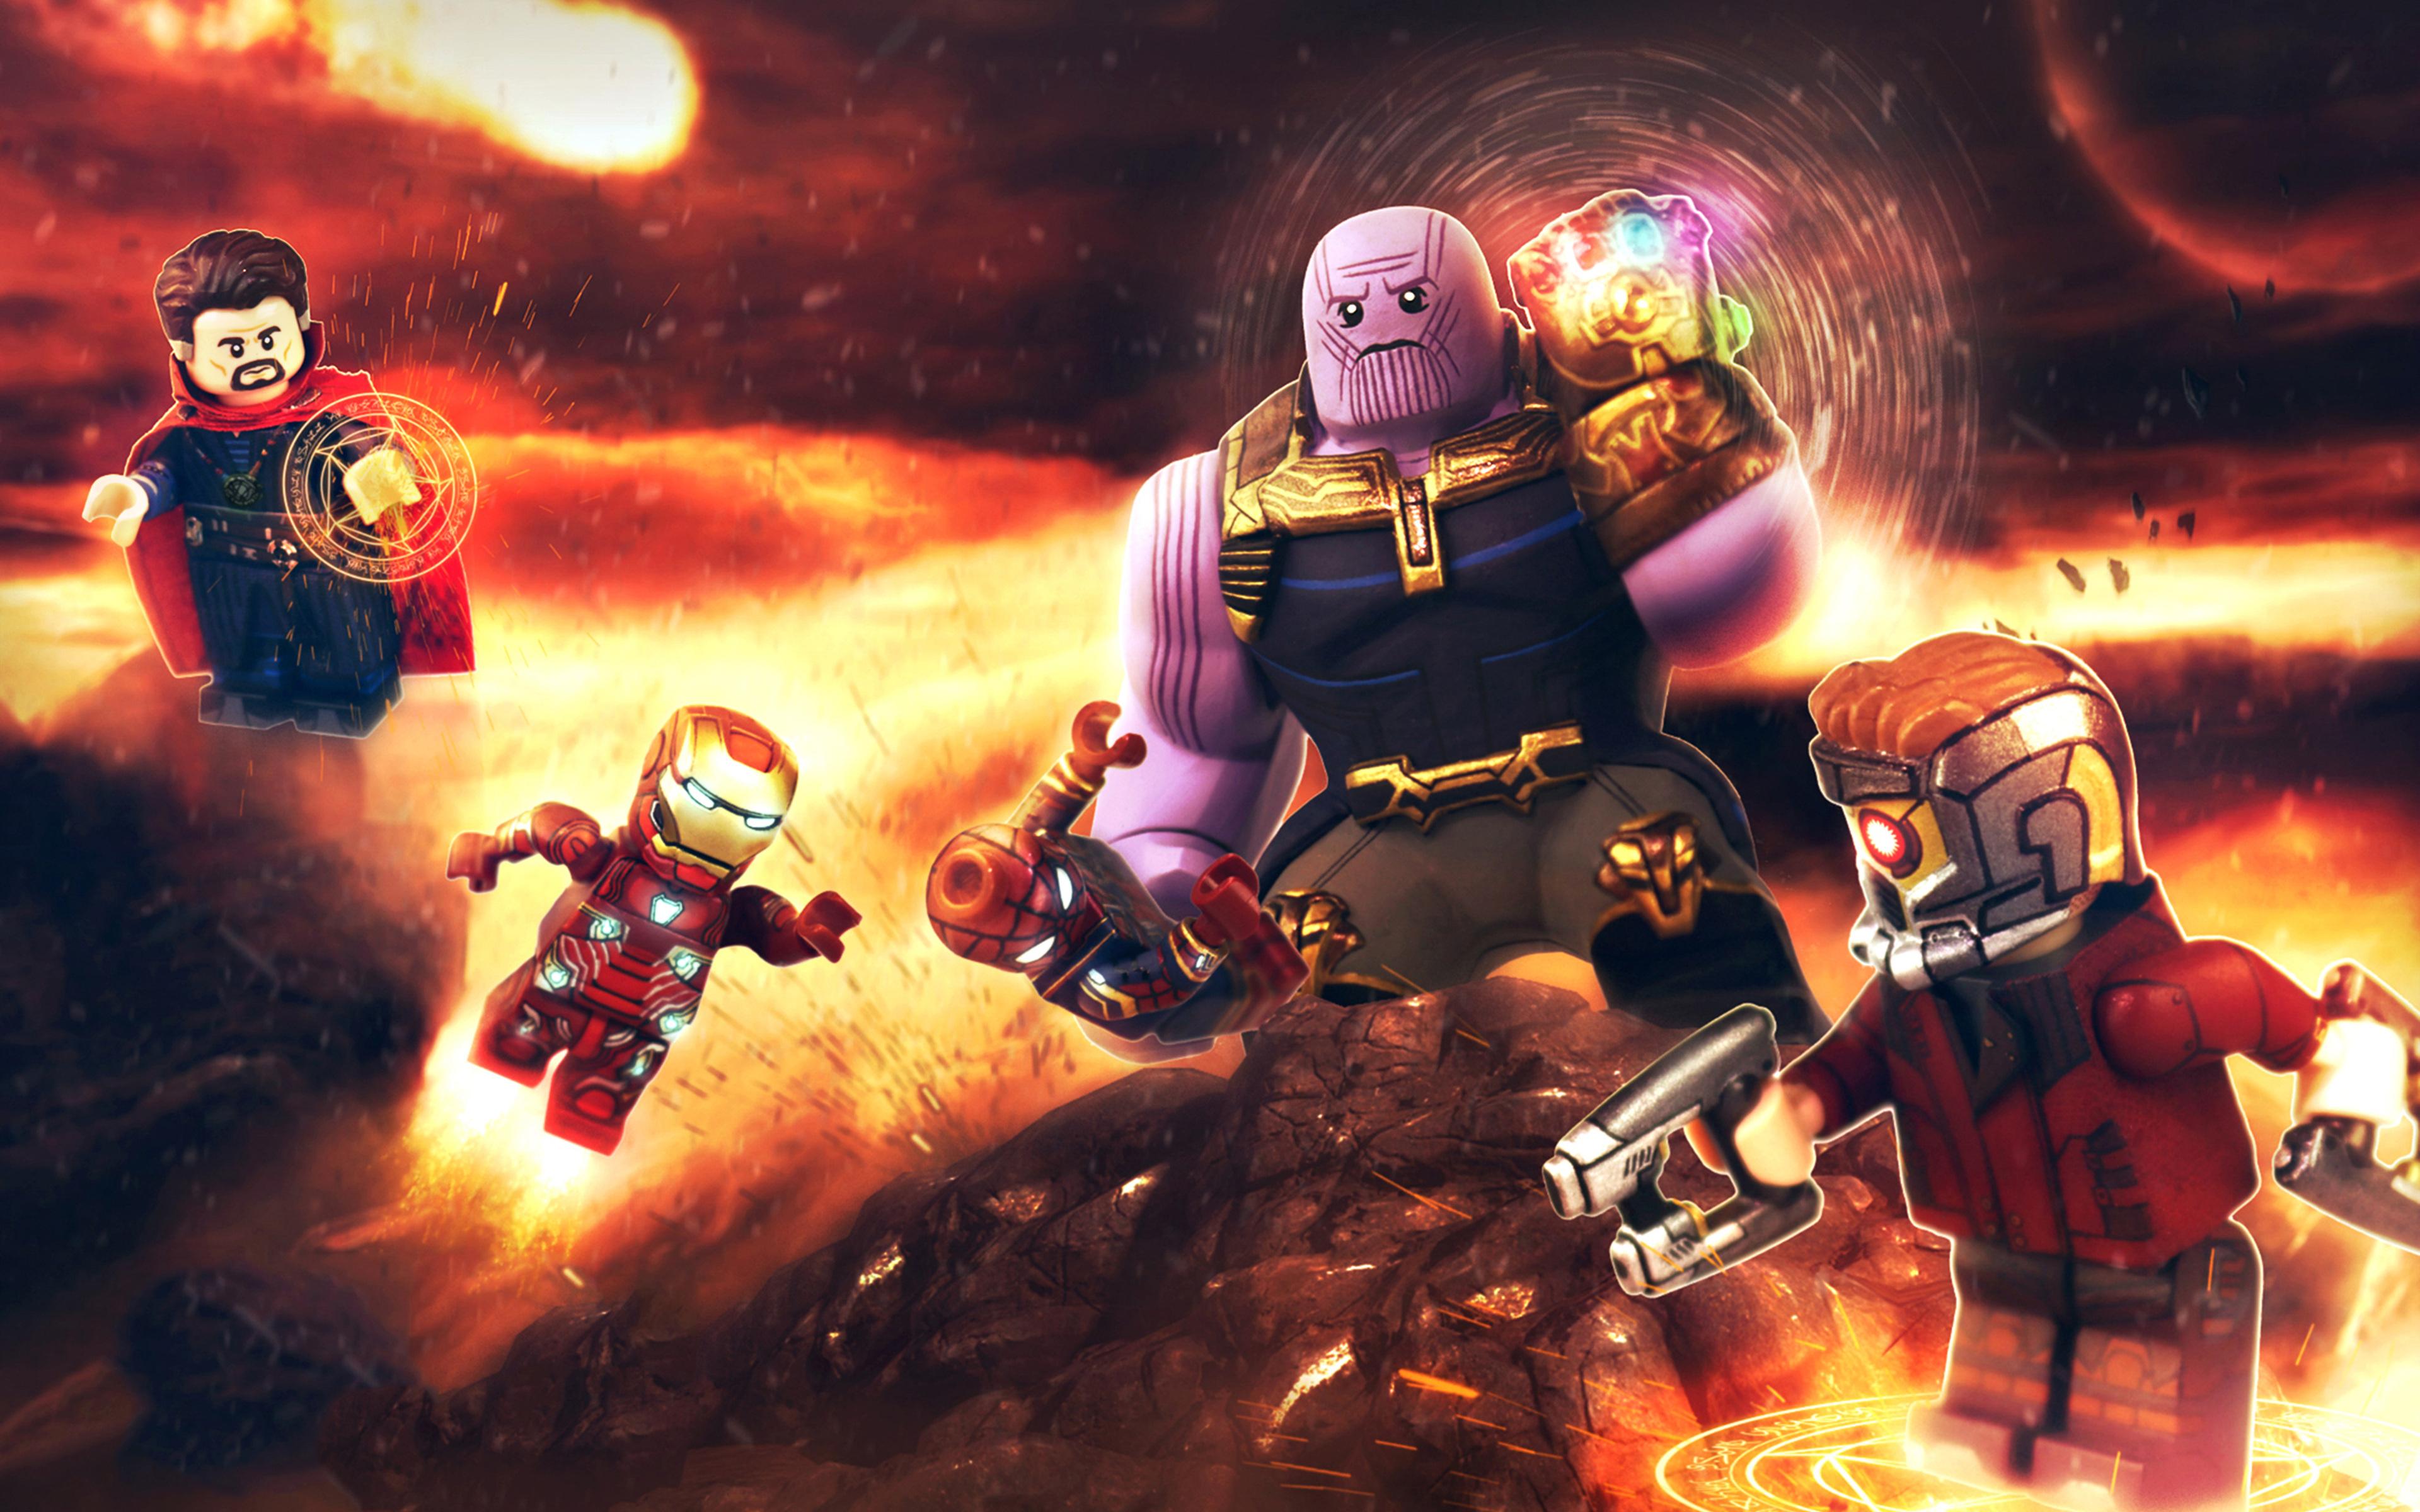 3840x2400 Avengers Infinity War Lego 4k Hd 4k Wallpapers Images